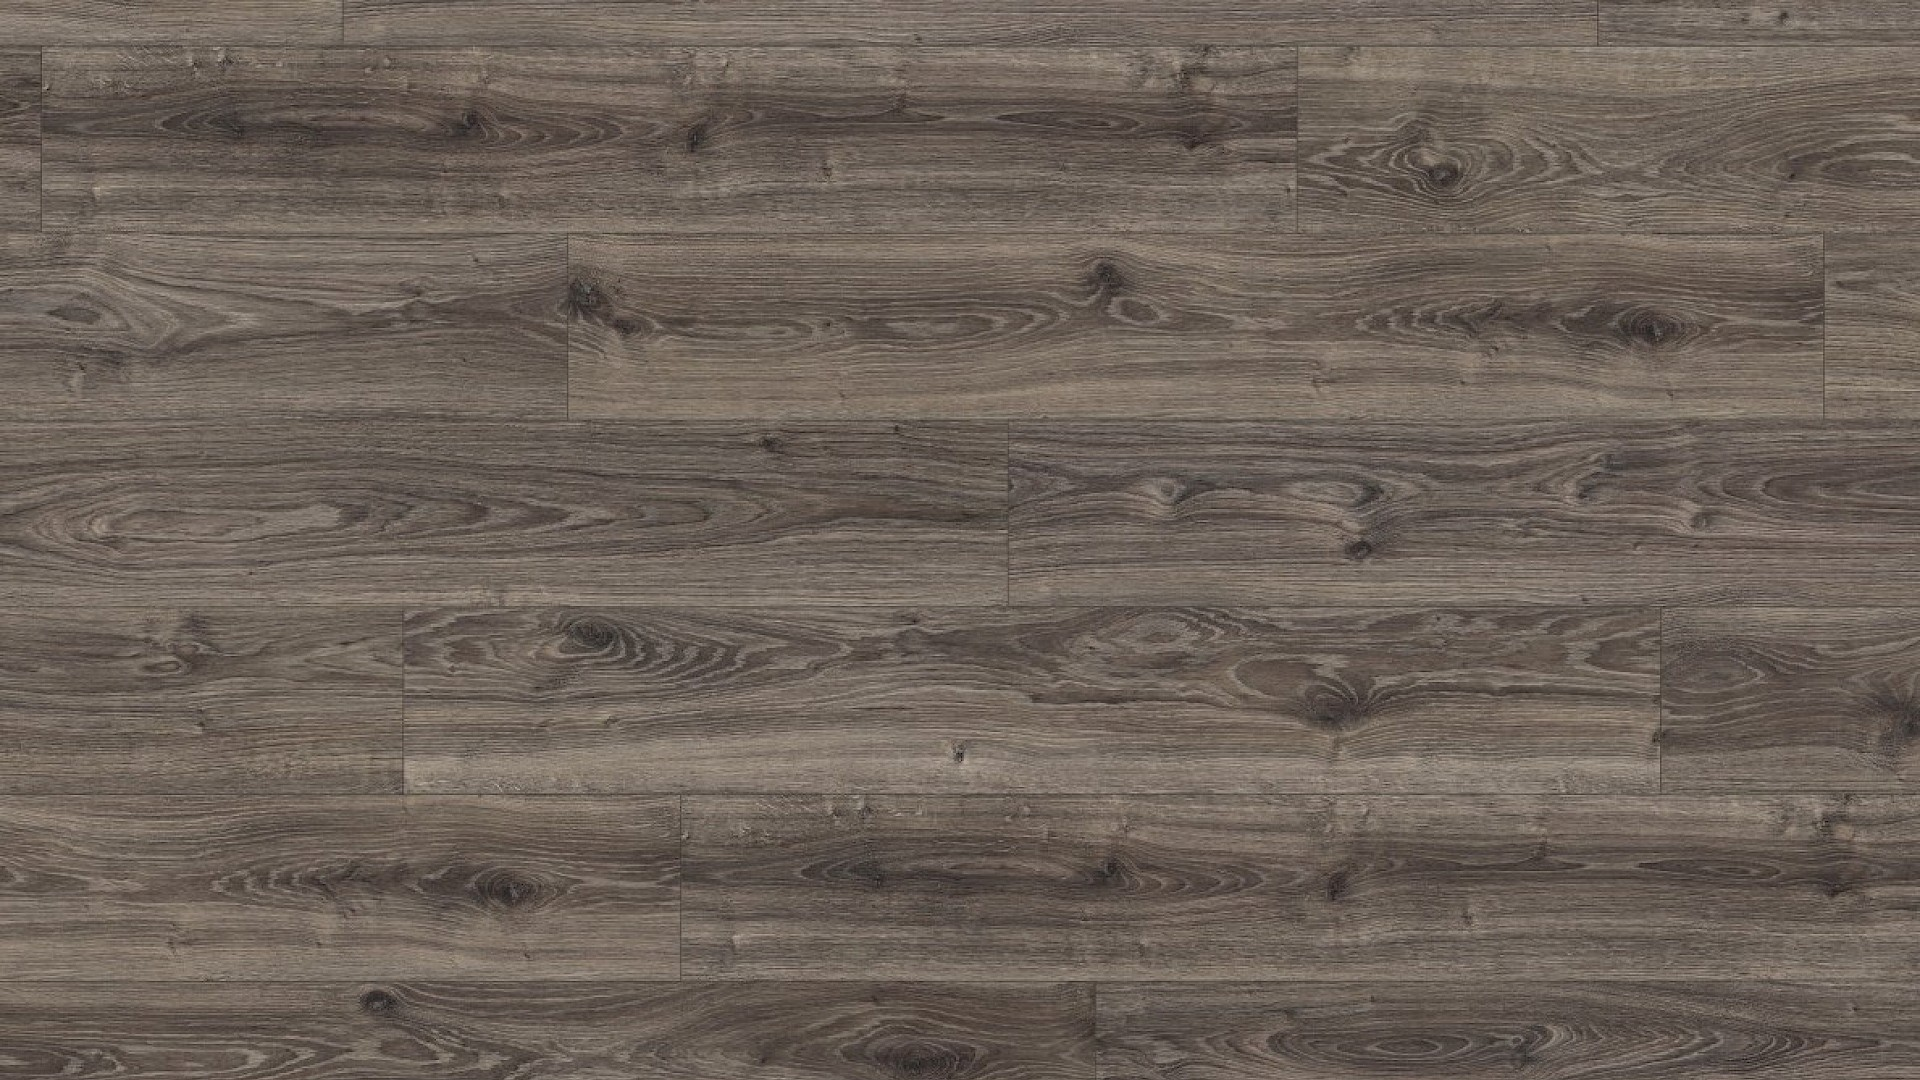 Egger Classic 7mm Dark Lasken Oak 4V Laminate Flooring EPL135